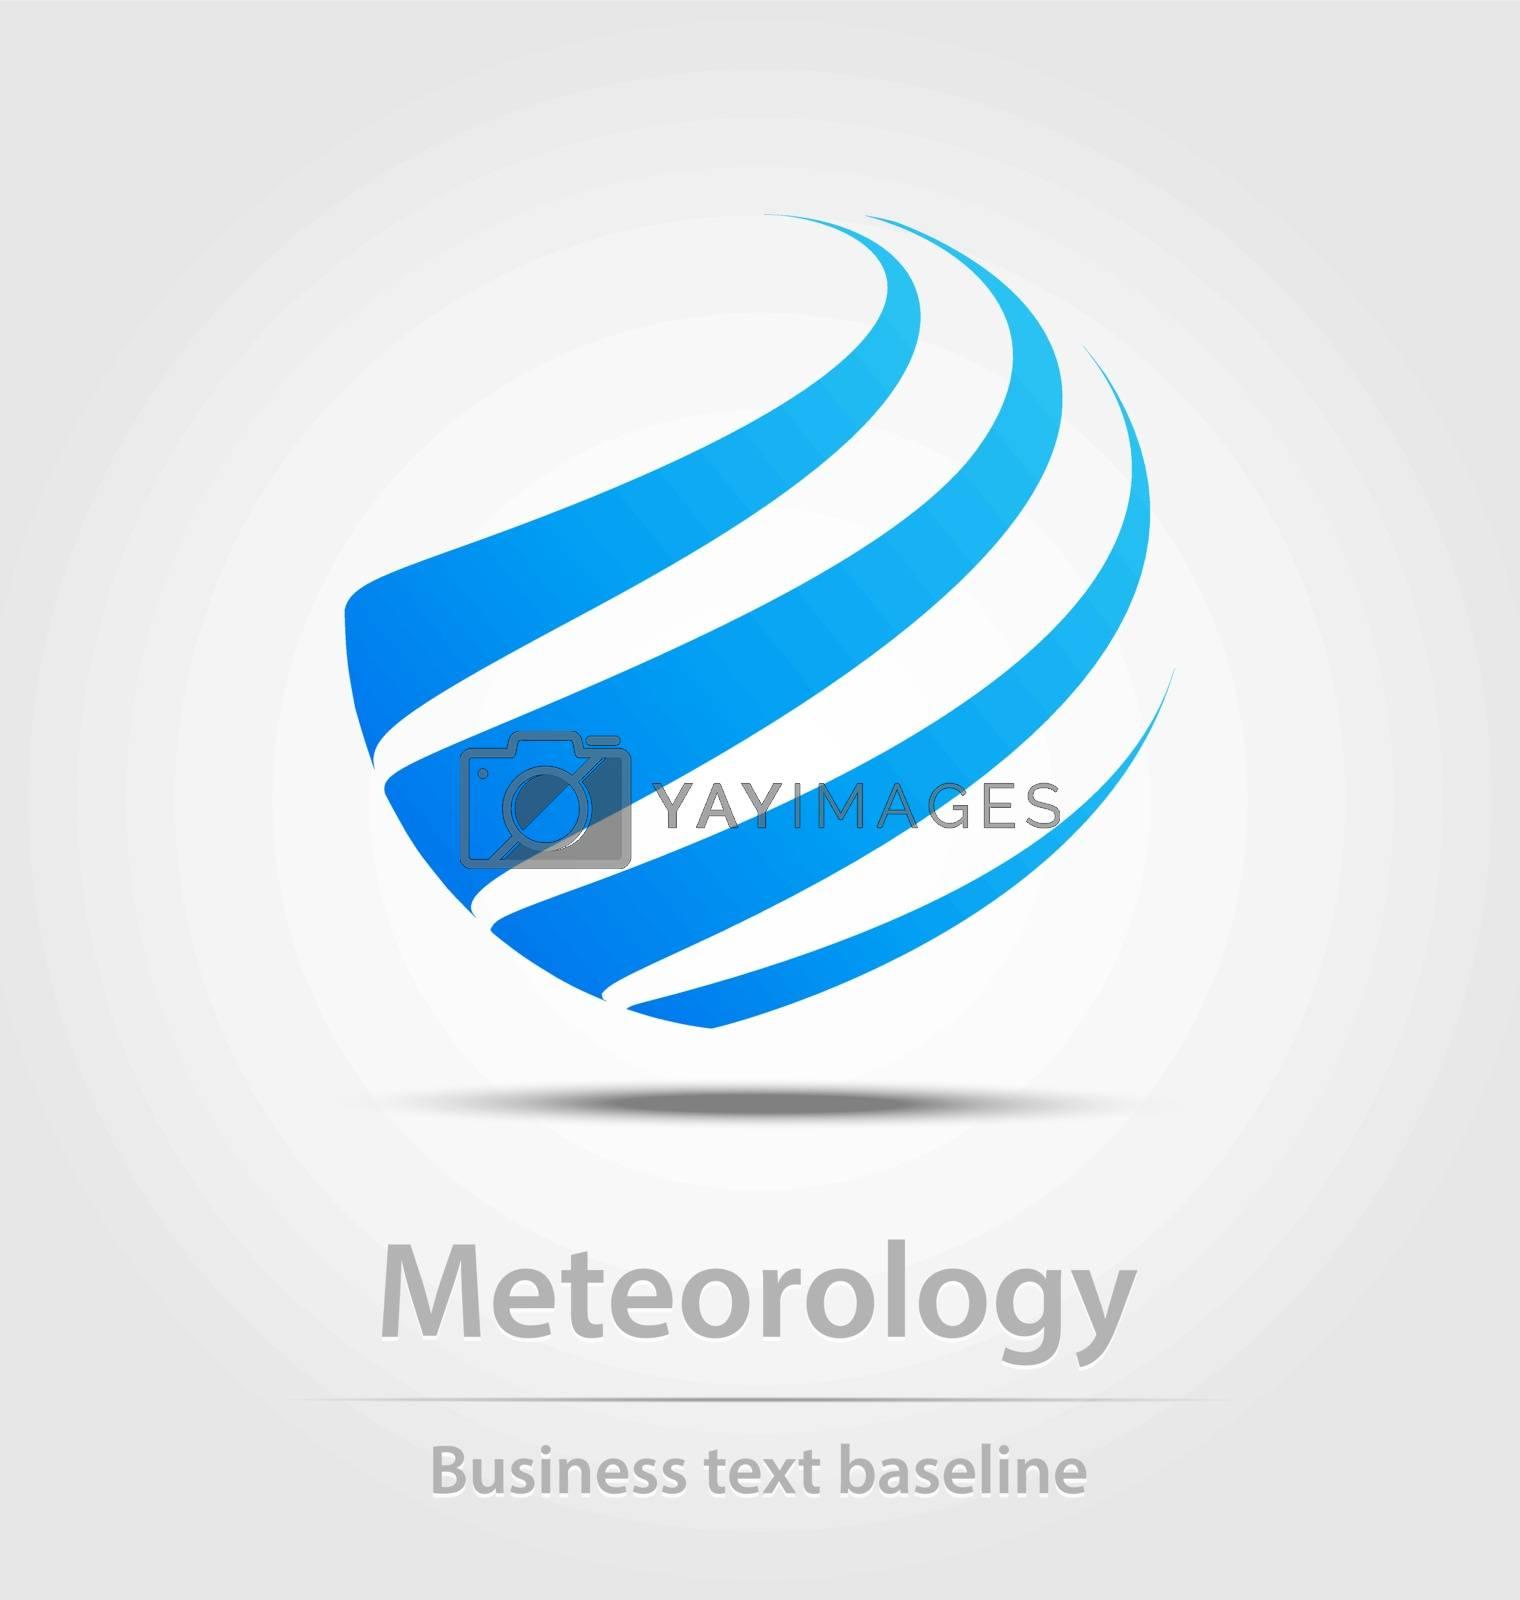 Originally designed business icon for creative tasks